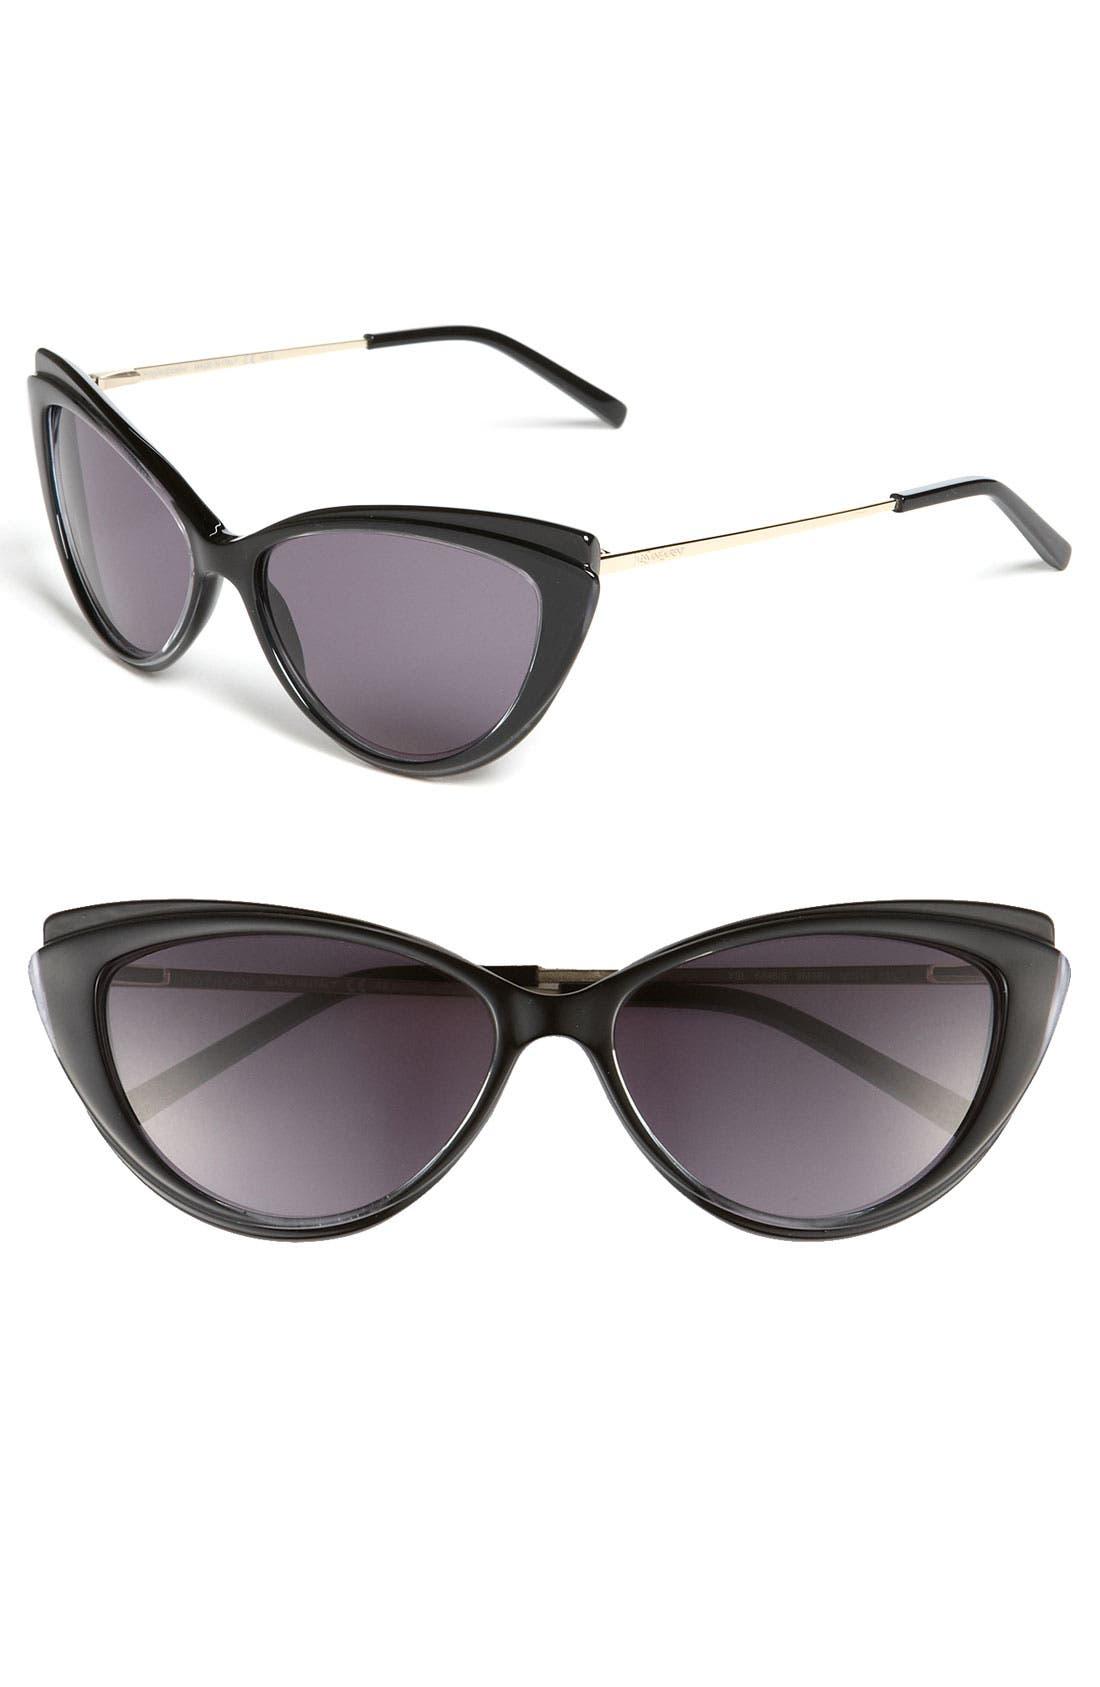 Main Image - Yves Saint Laurent Cat's Eye Sunglasses